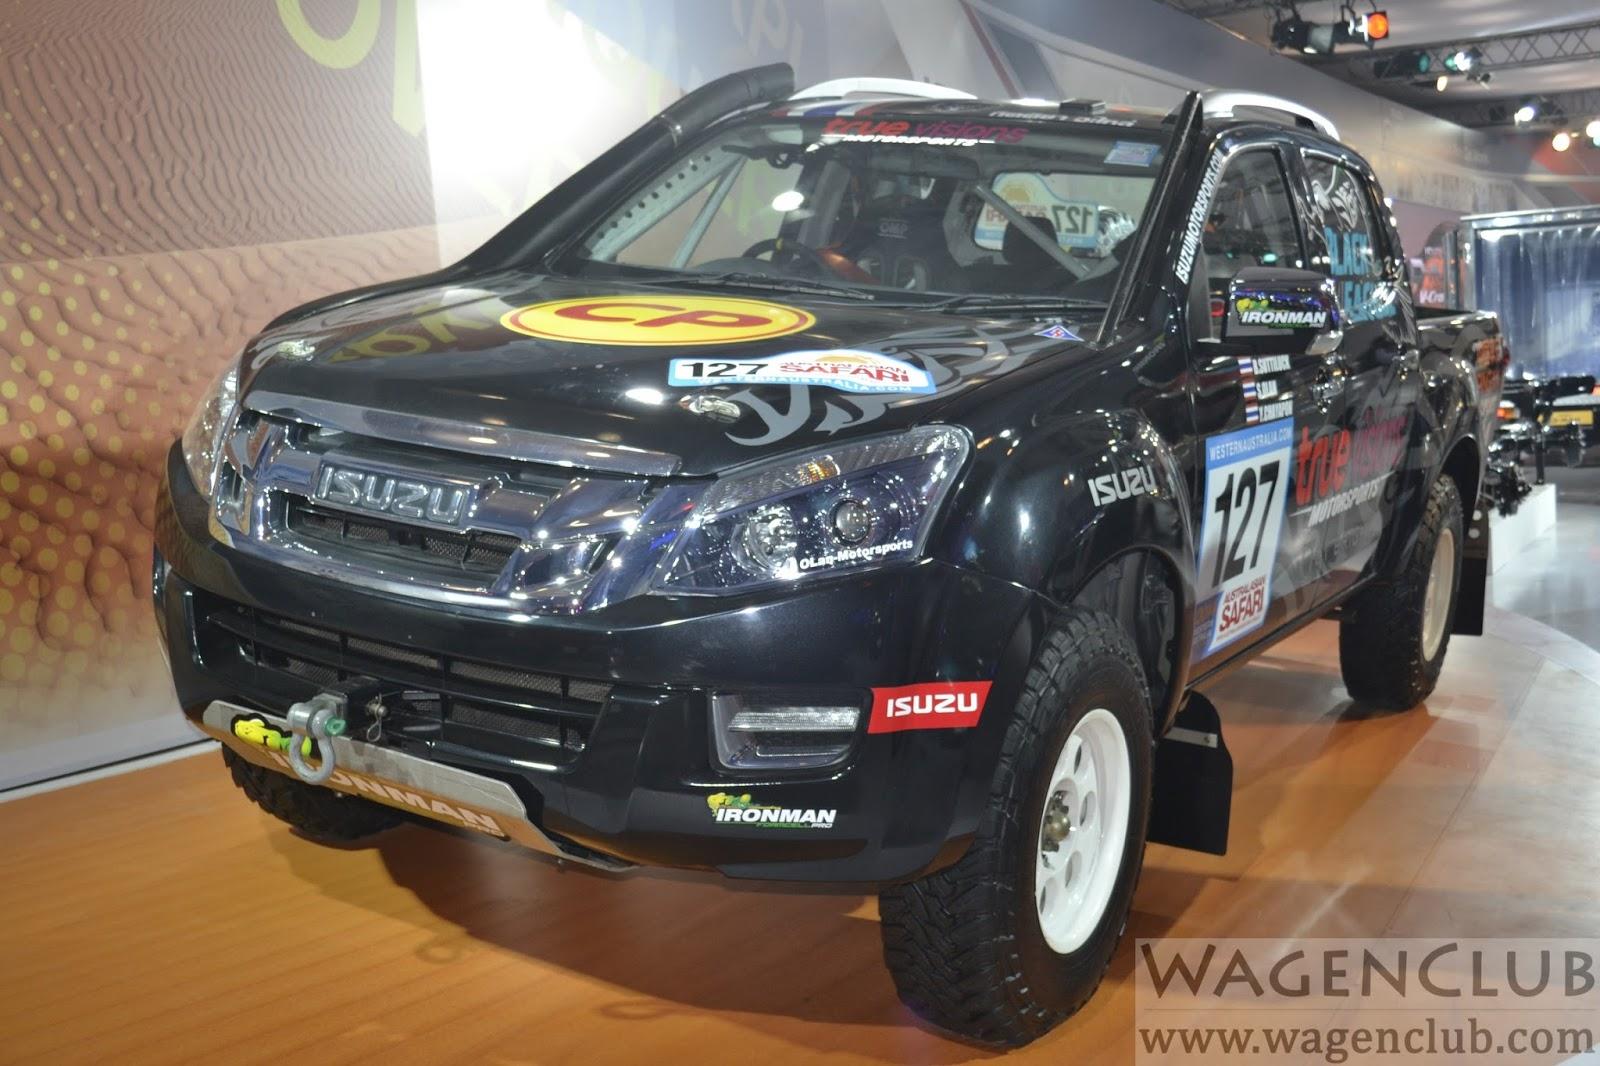 Isuzu d max rally edition image gallery